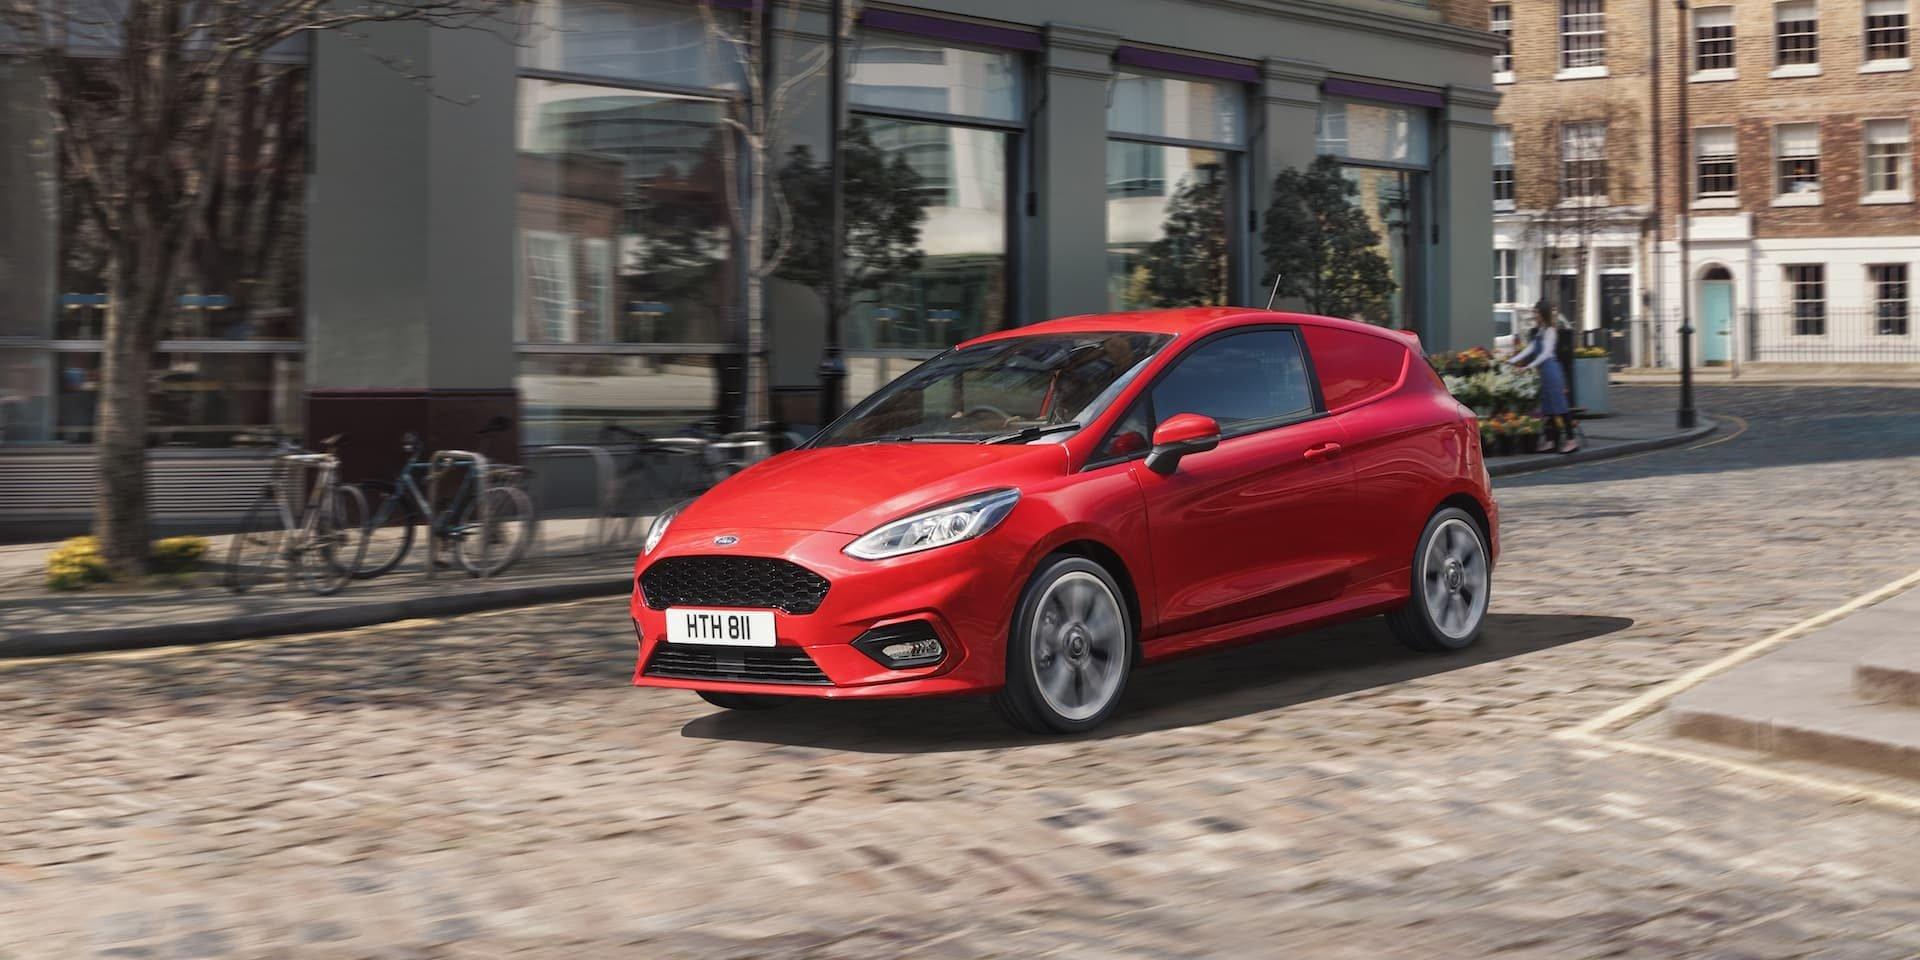 Ford Fiesta Sport Van test drive 2019 | The Van Expert